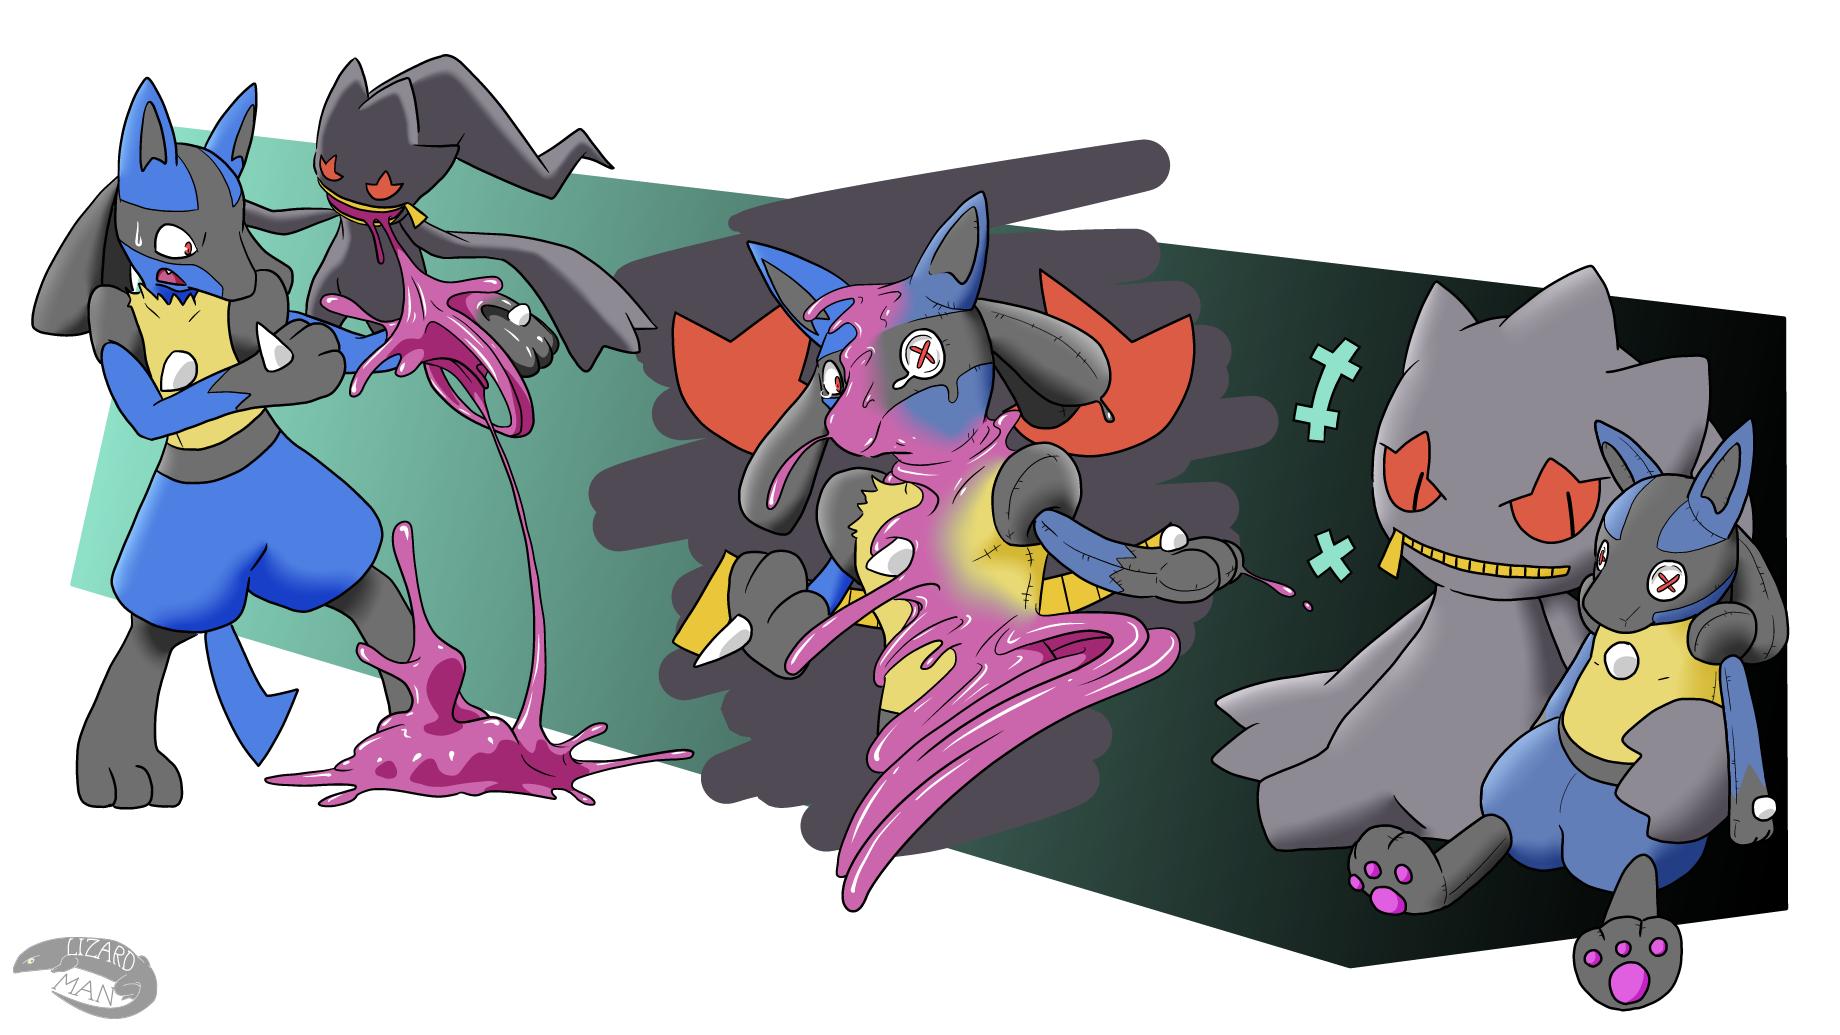 Curse of banette by nesise on deviantart - Branette pokemon y ...